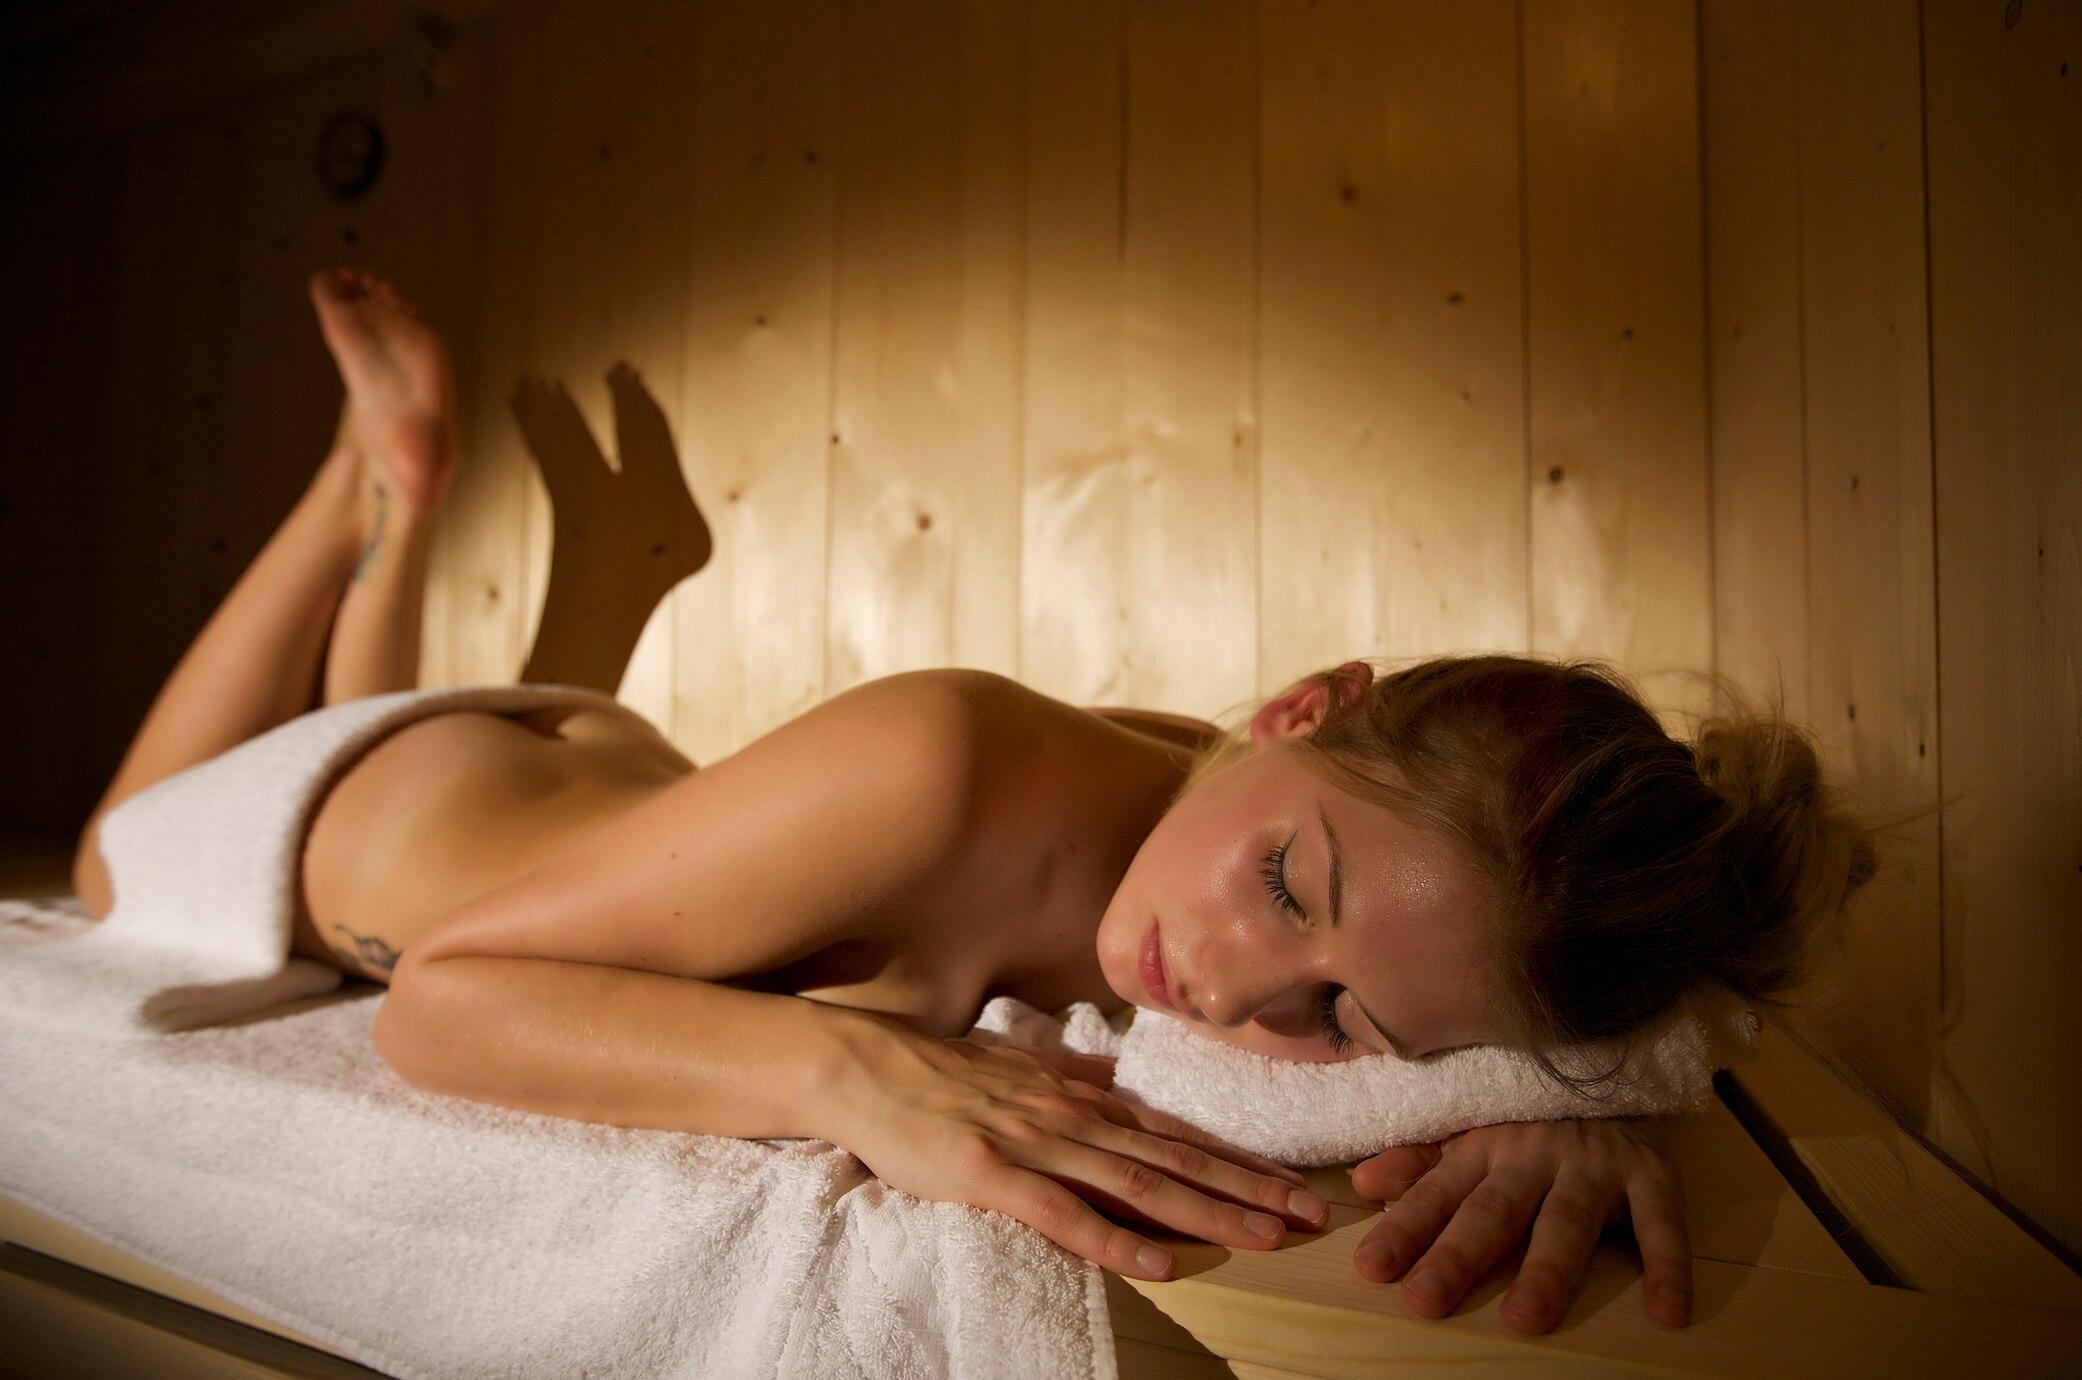 finnische frauen nackt